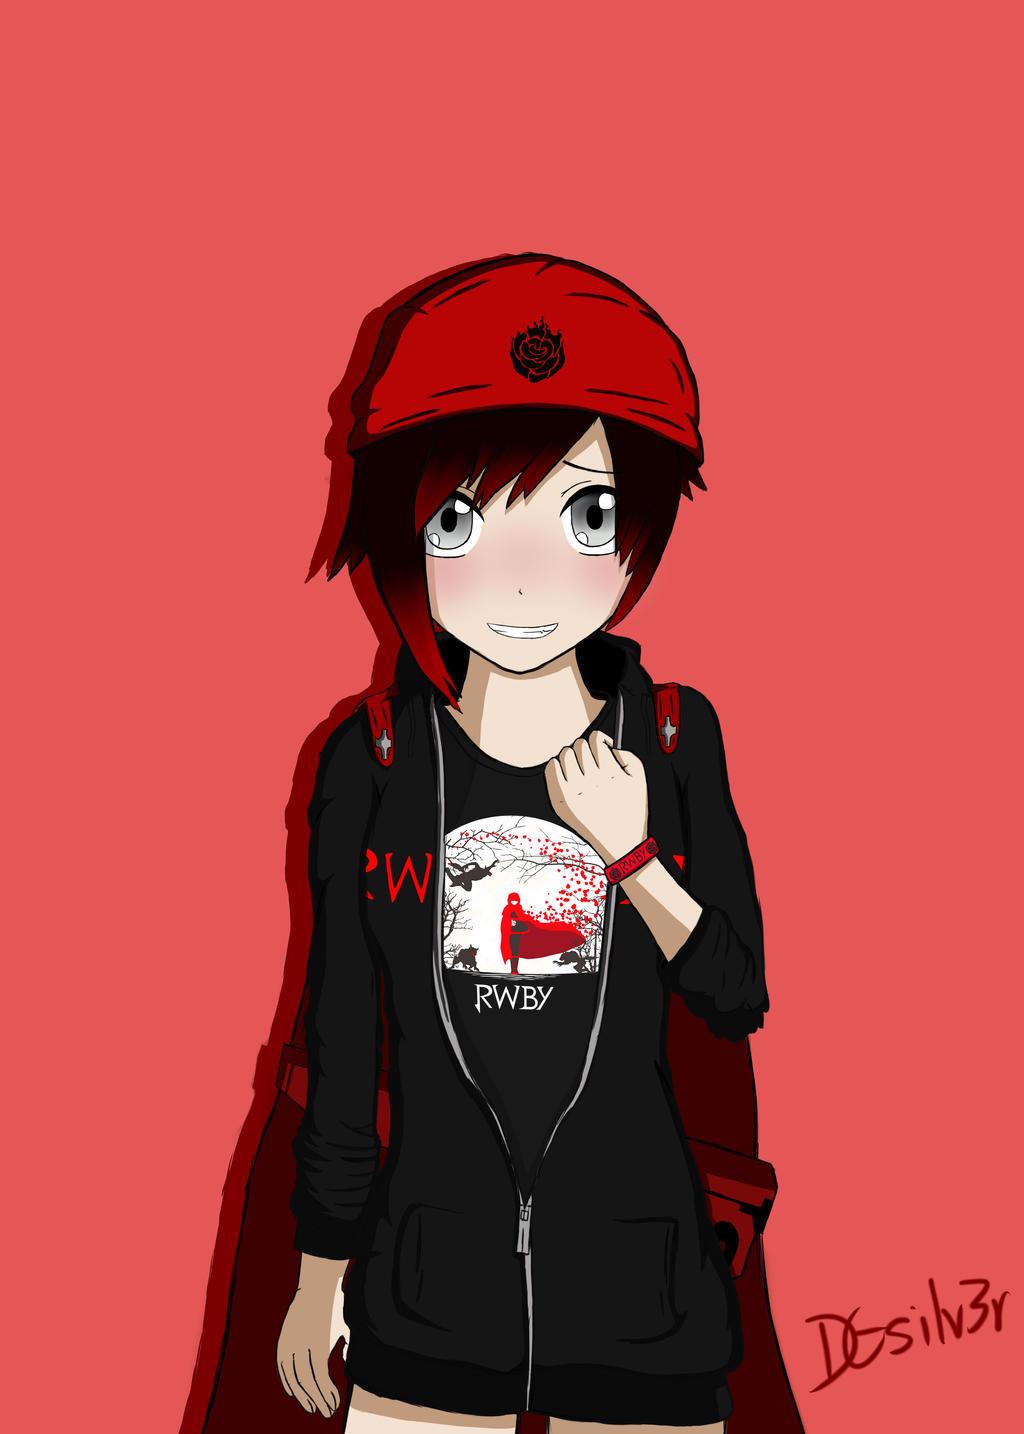 Ruby rose in rwby merchandise by dgsilv3r on deviantart - Rwby deviantart ...